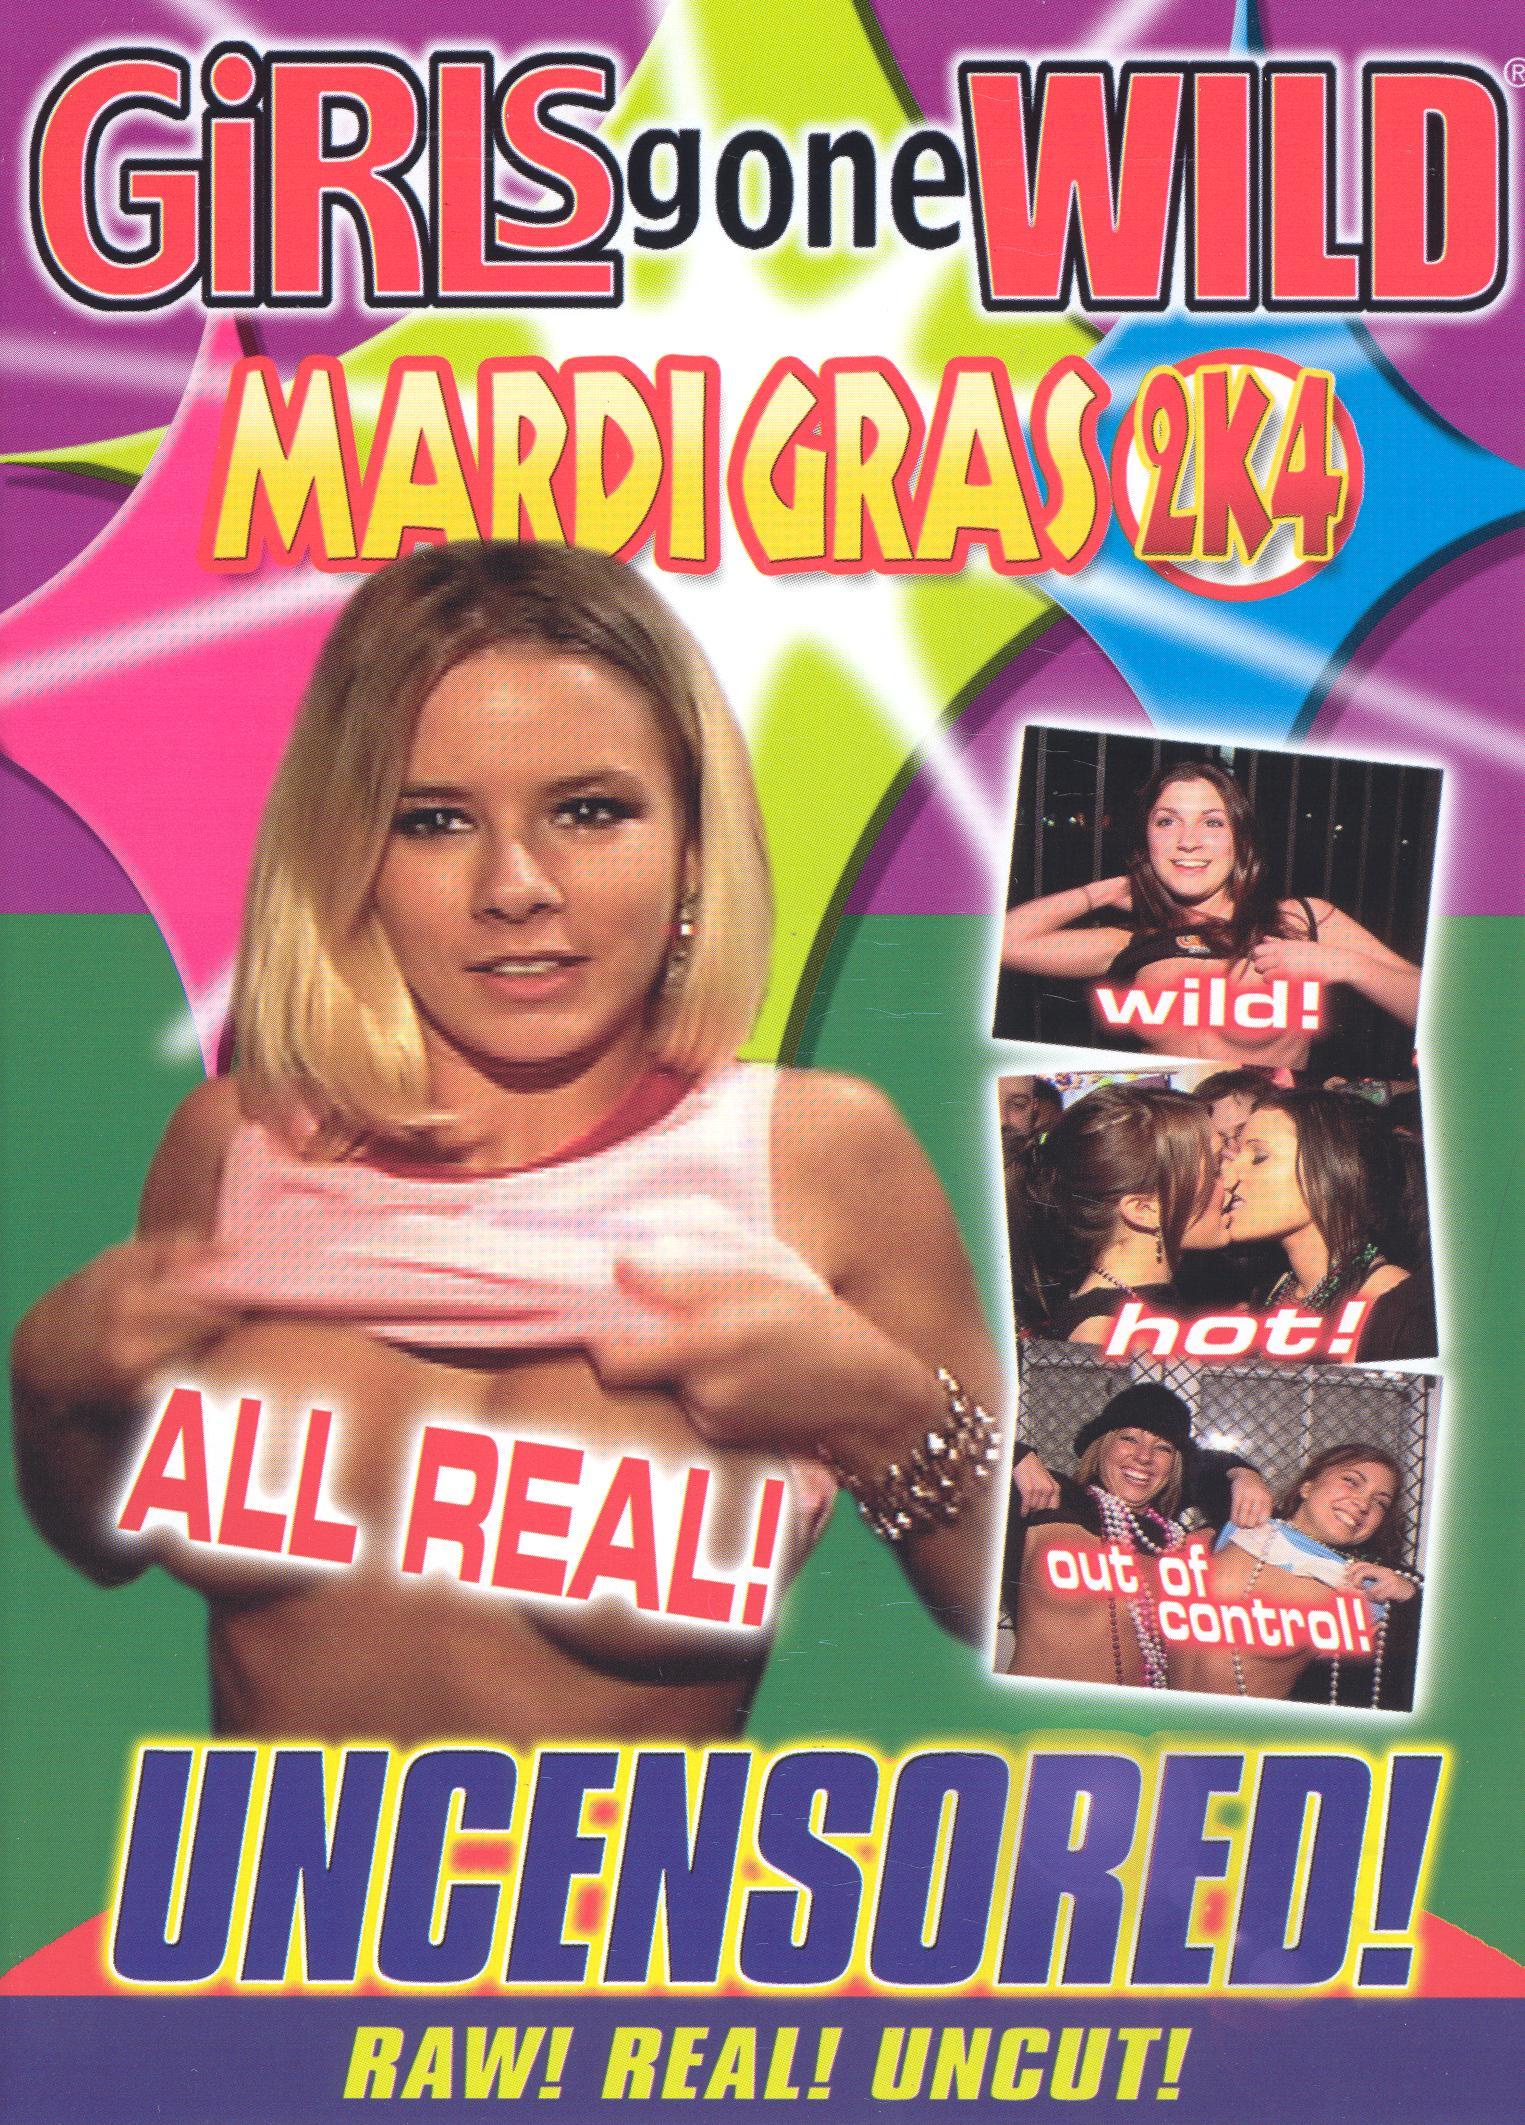 Girls Gone Wild: Mardi Gras 2K4